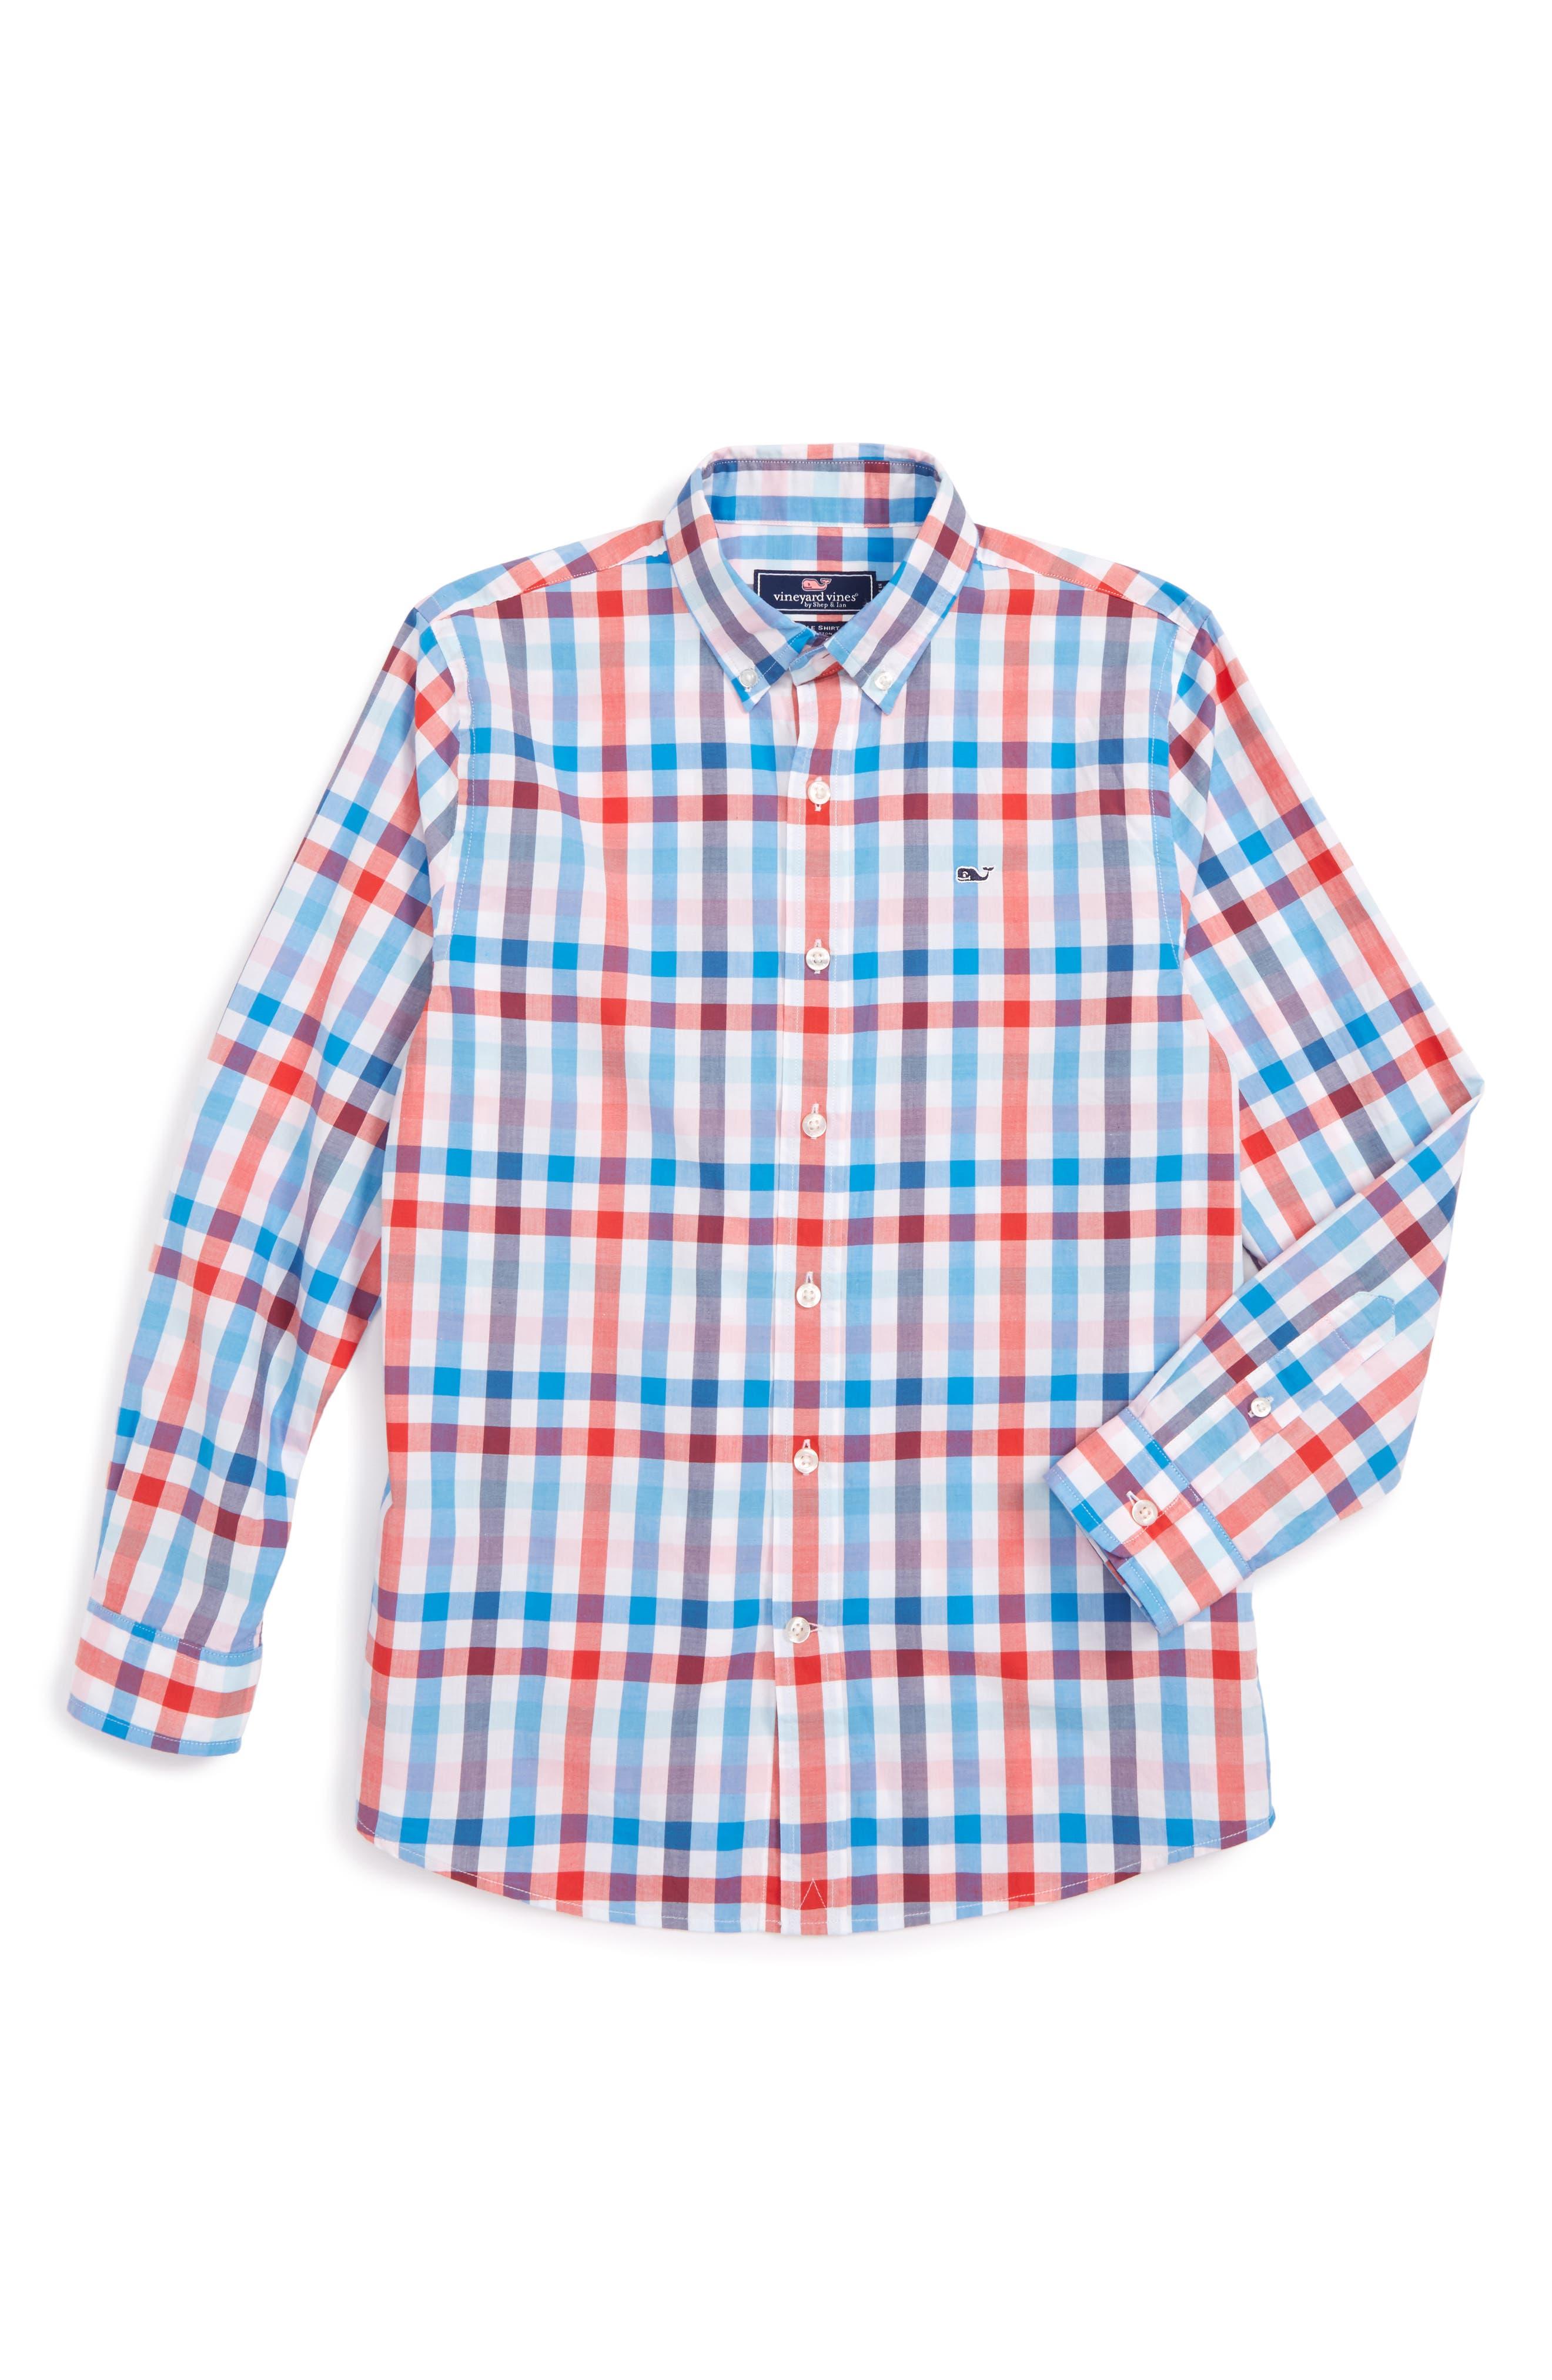 Vineyard Vines Chalwell Gingham Whale Shirt (Toddler Boys, Little Boys & Big Boys)